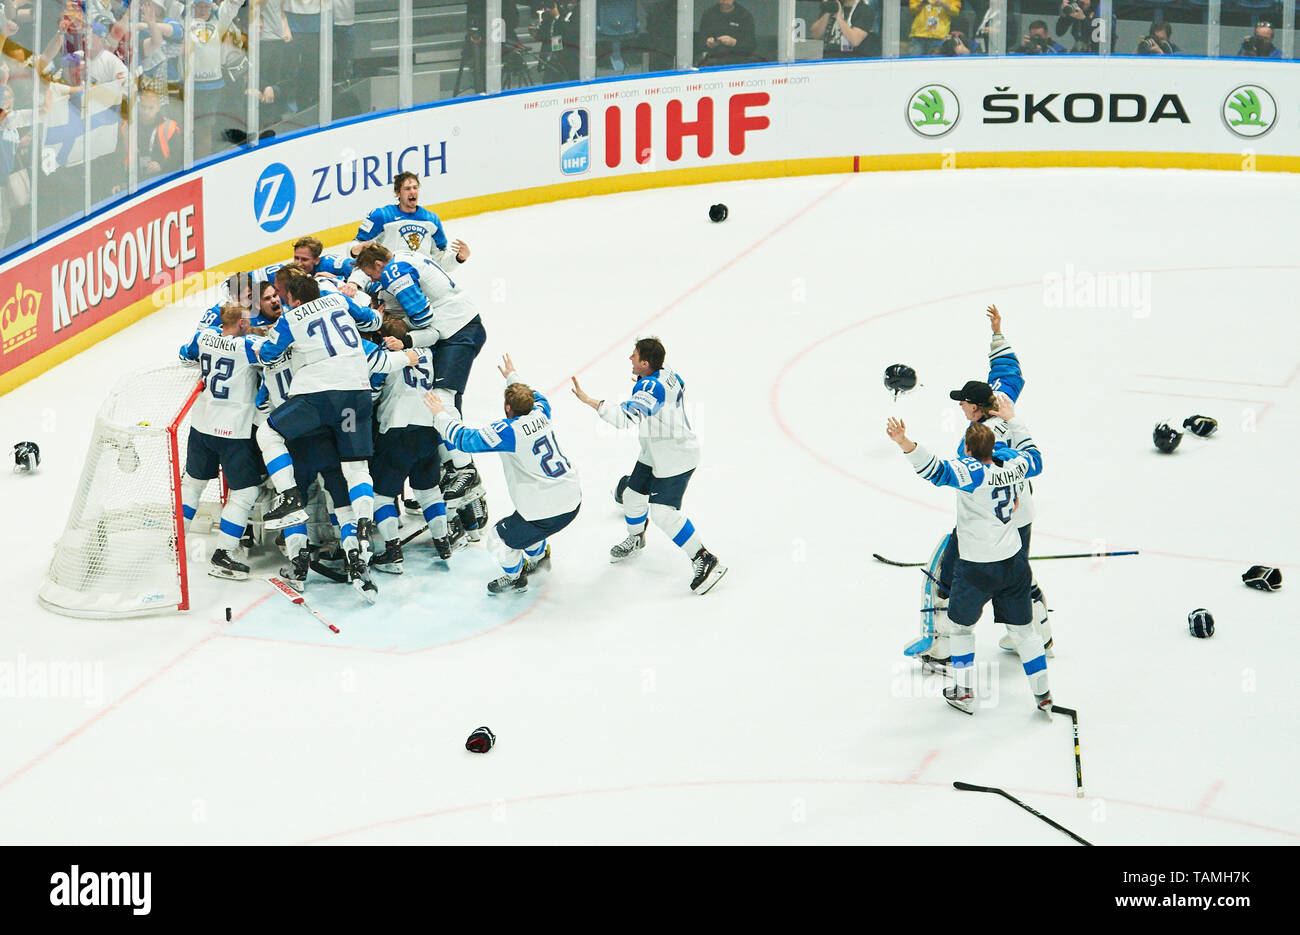 Bratislava, Slovakia. 26th May, 2019. Finland won the title and celebrate, Cheering, joy, emotions, celebrating, laughing, cheering, rejoice, tearing up the arms, clenching the fist, celebrate, celebration, Torjubel, CANADA - FINLAND 1-3 Kanada - Finnland FINAL IIHF ICE HOCKEY WORLD CHAMPIONSHIPS in Bratislava, Slovakia, Slowakei, May 26, 2019, Season 2018/2019, Credit: Peter Schatz/Alamy Live News - Stock Image